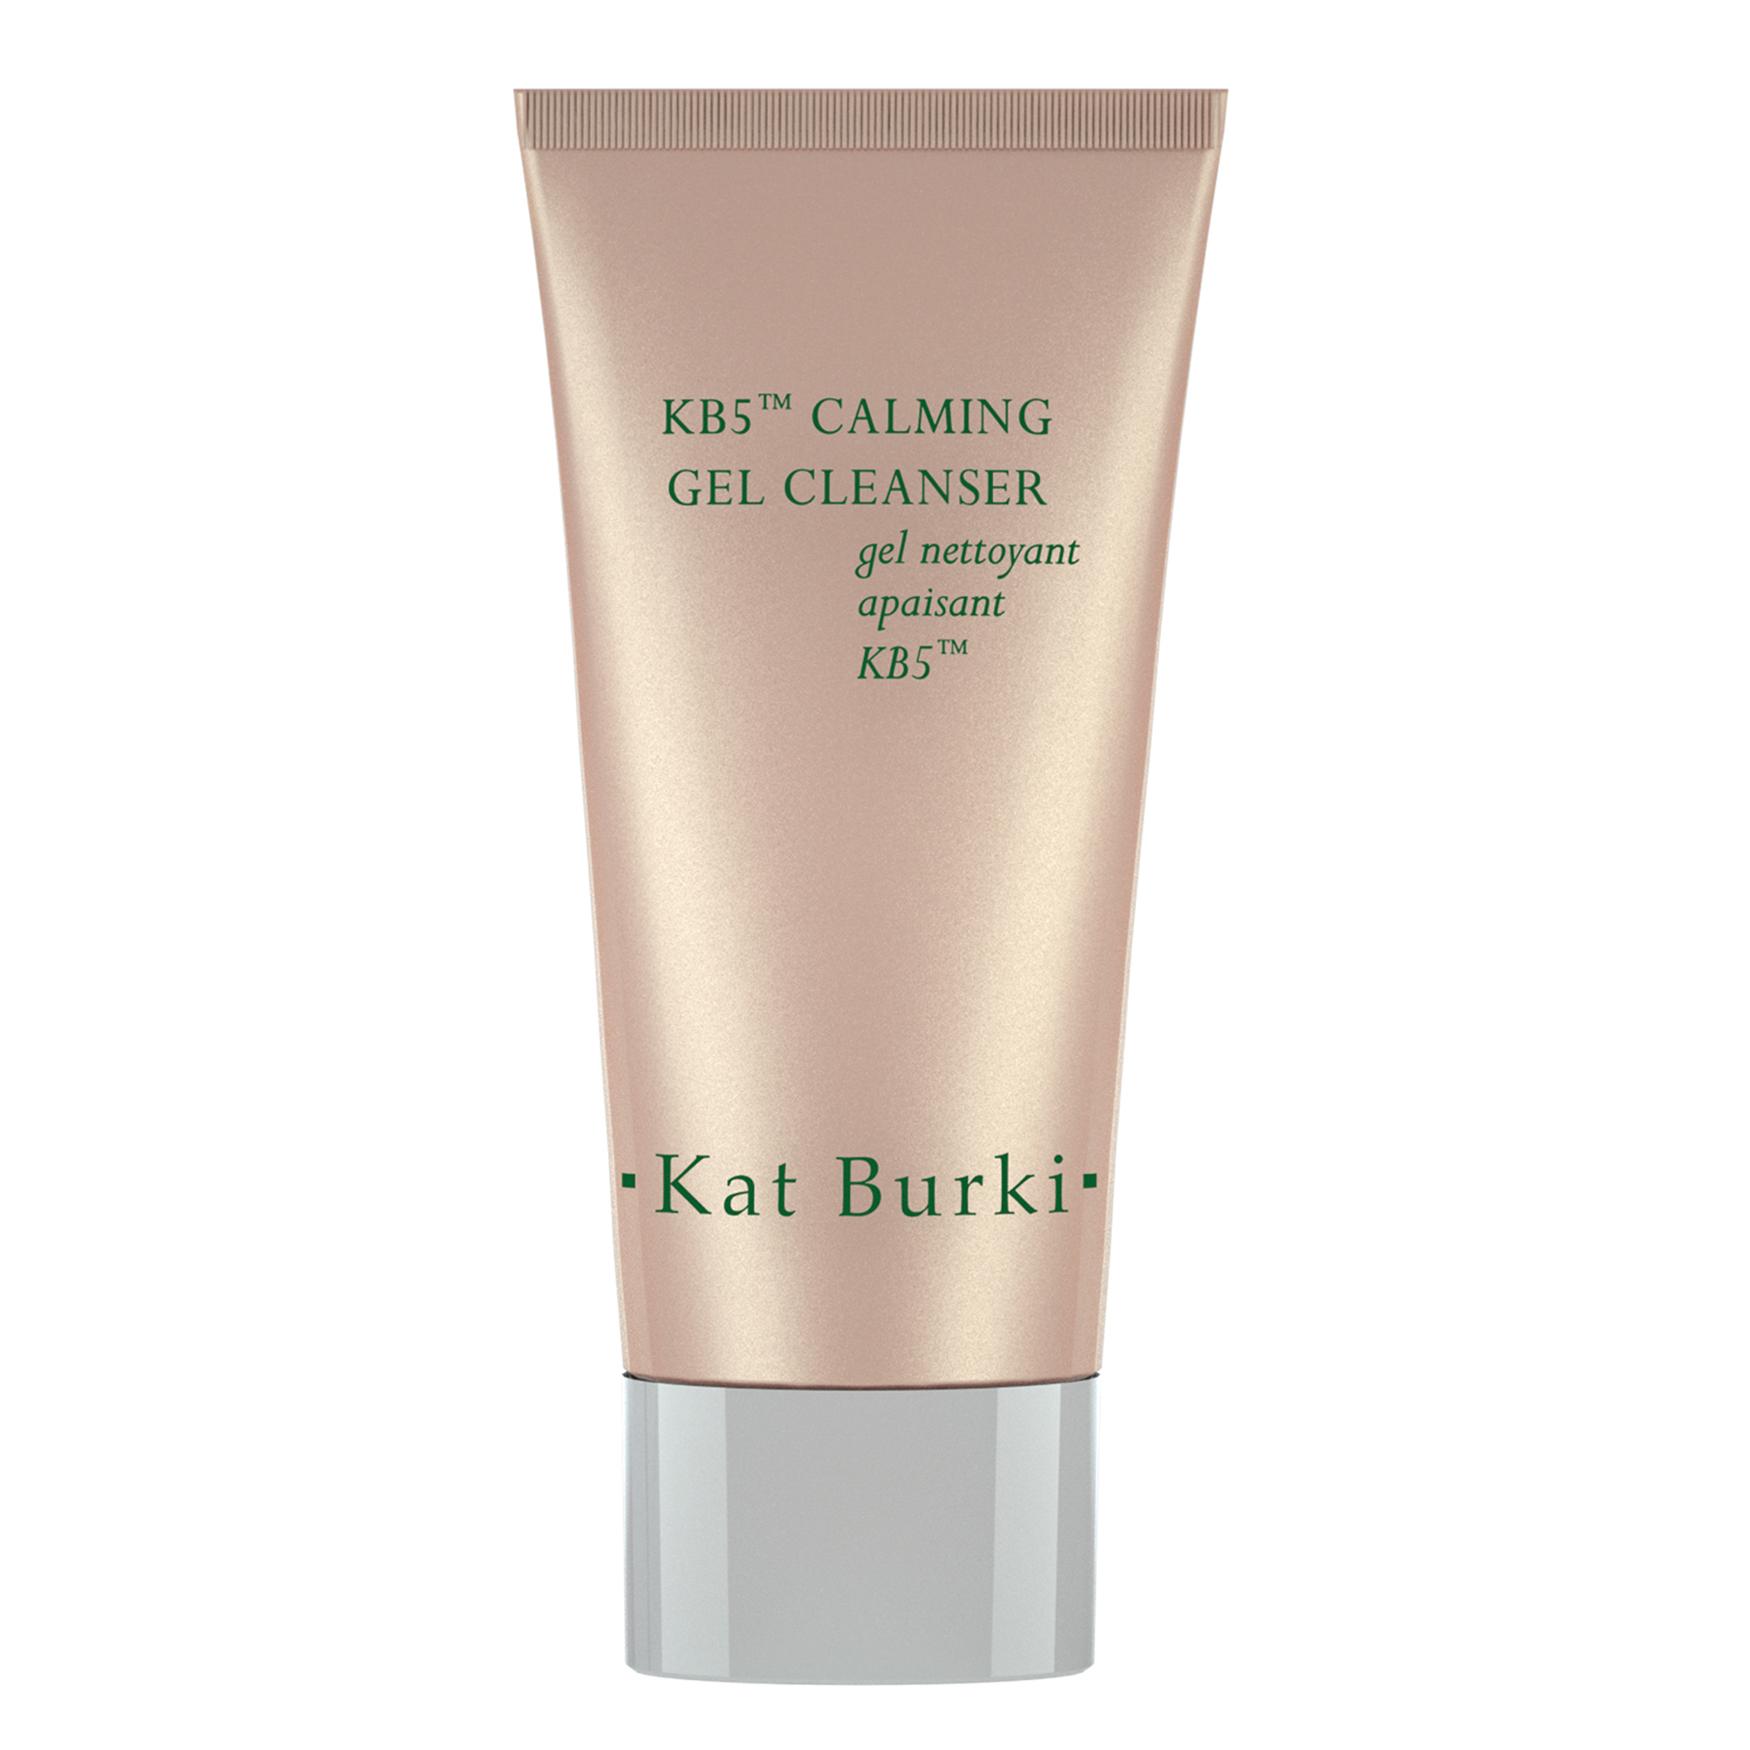 KB5 Calming Gel Cleanser, , large